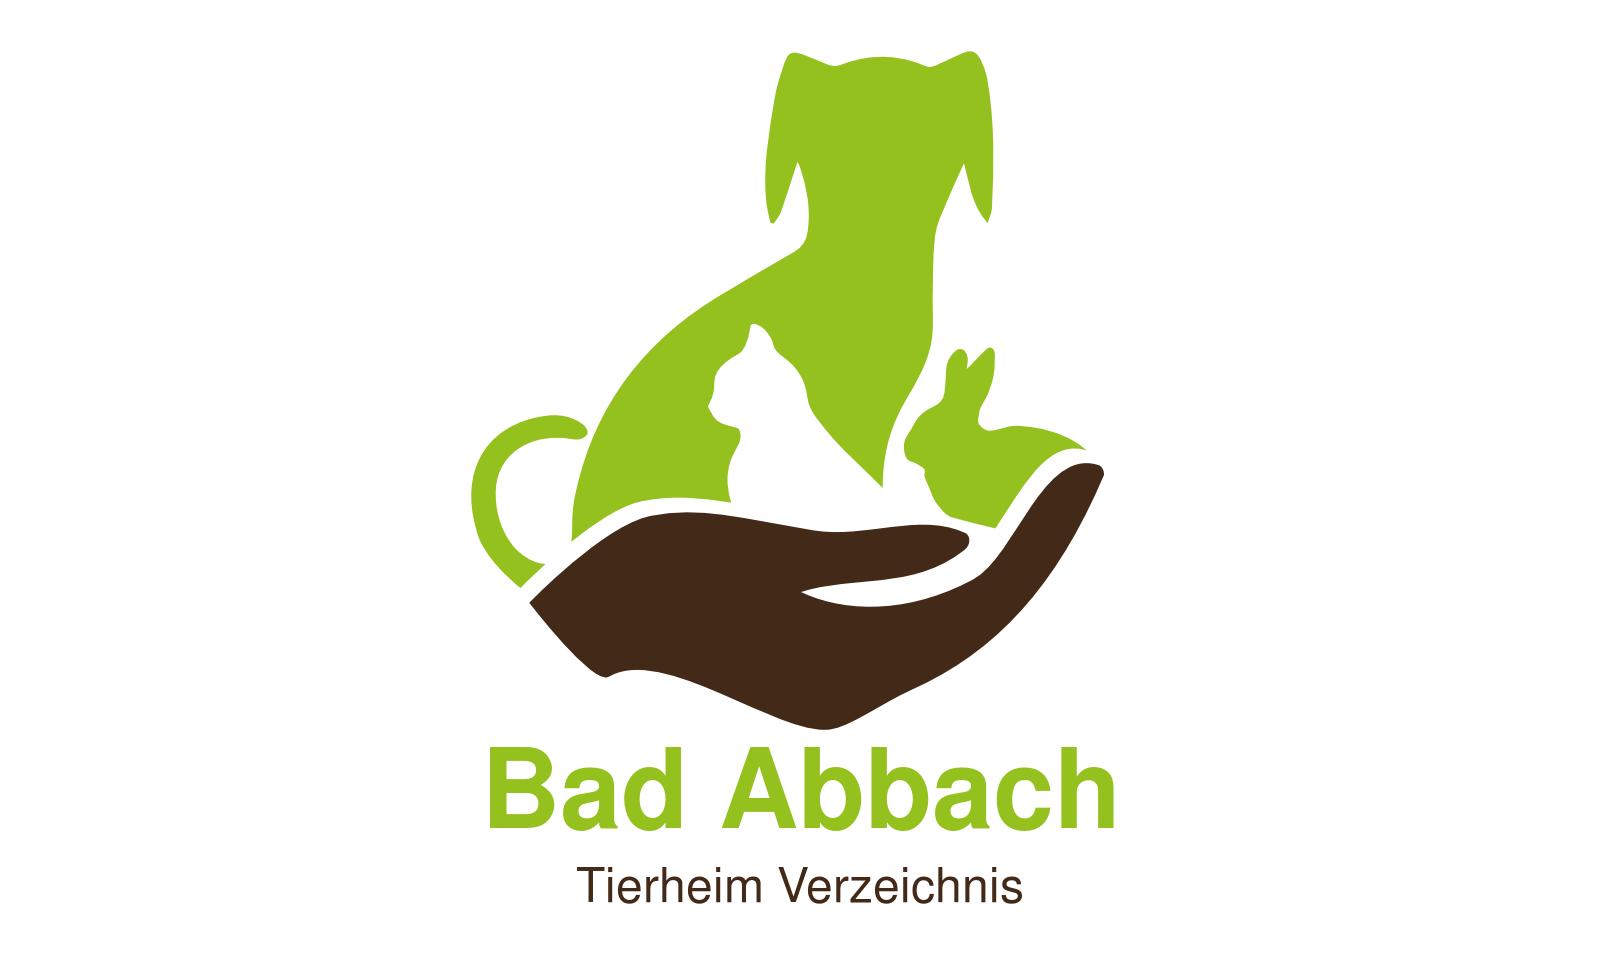 Tierheim Bad Abbach